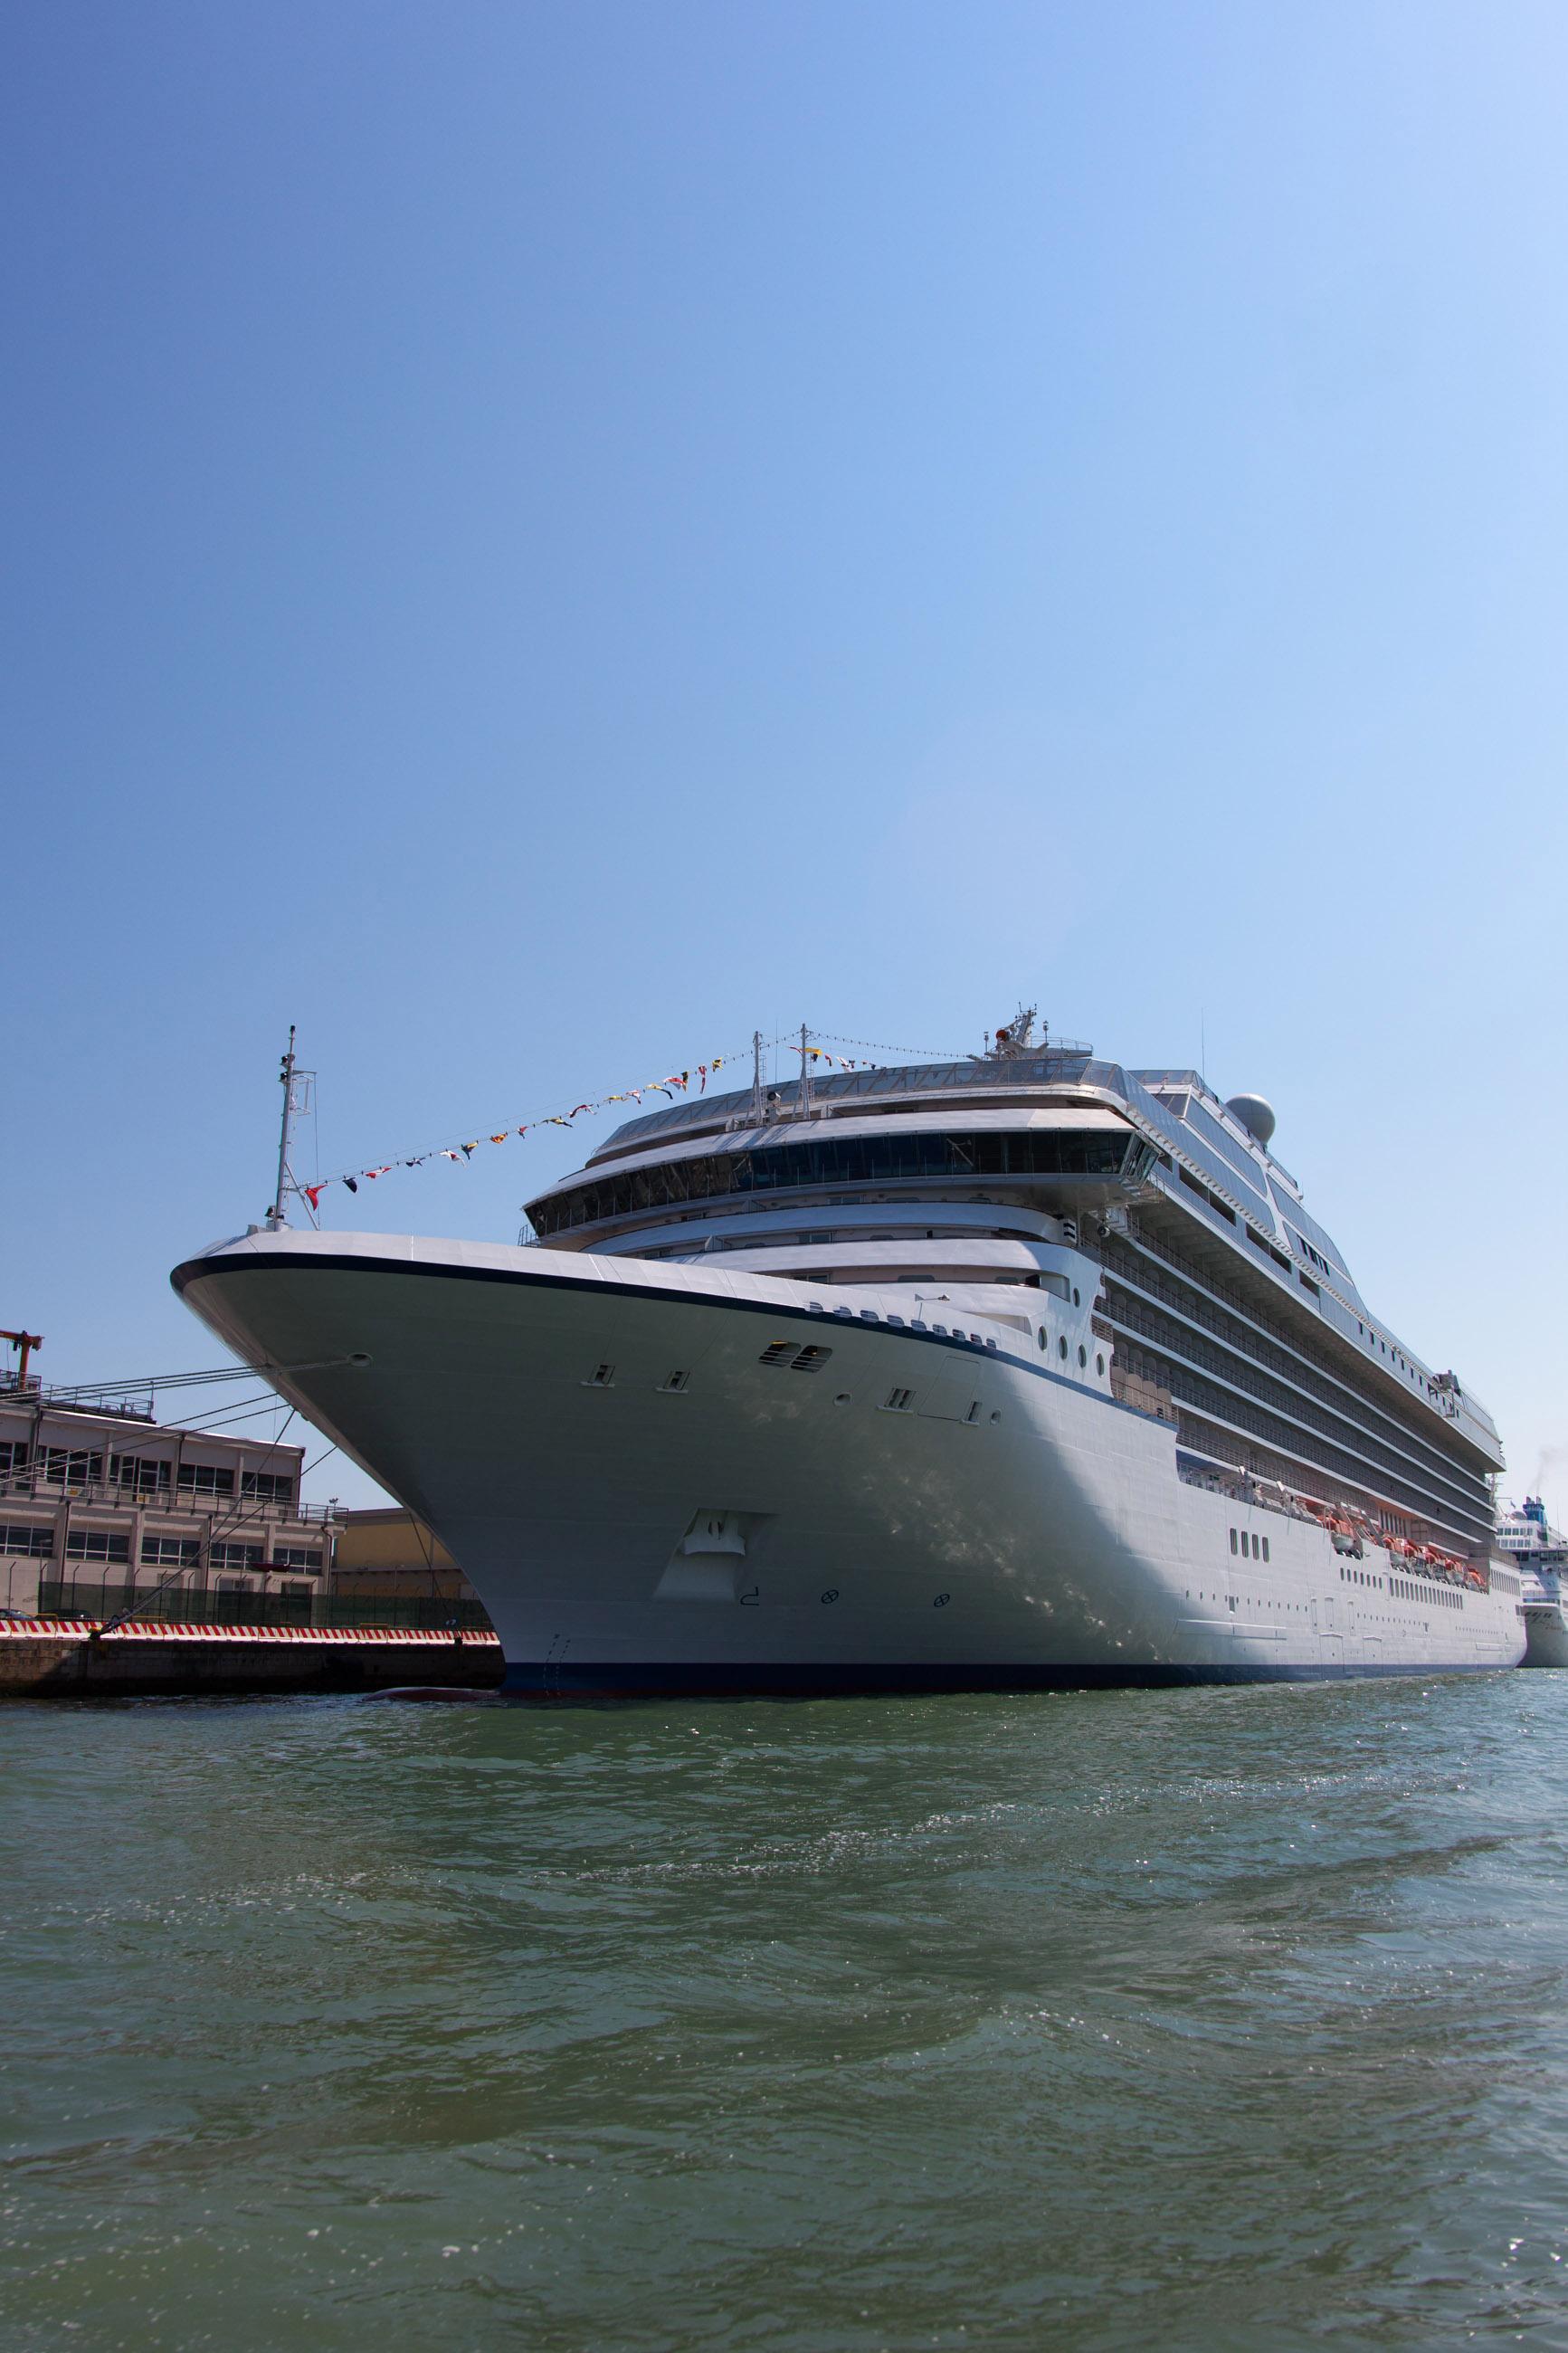 Cruise ship in port - side view, Beautiful, Tropic, Summer, Sunrise, HQ Photo